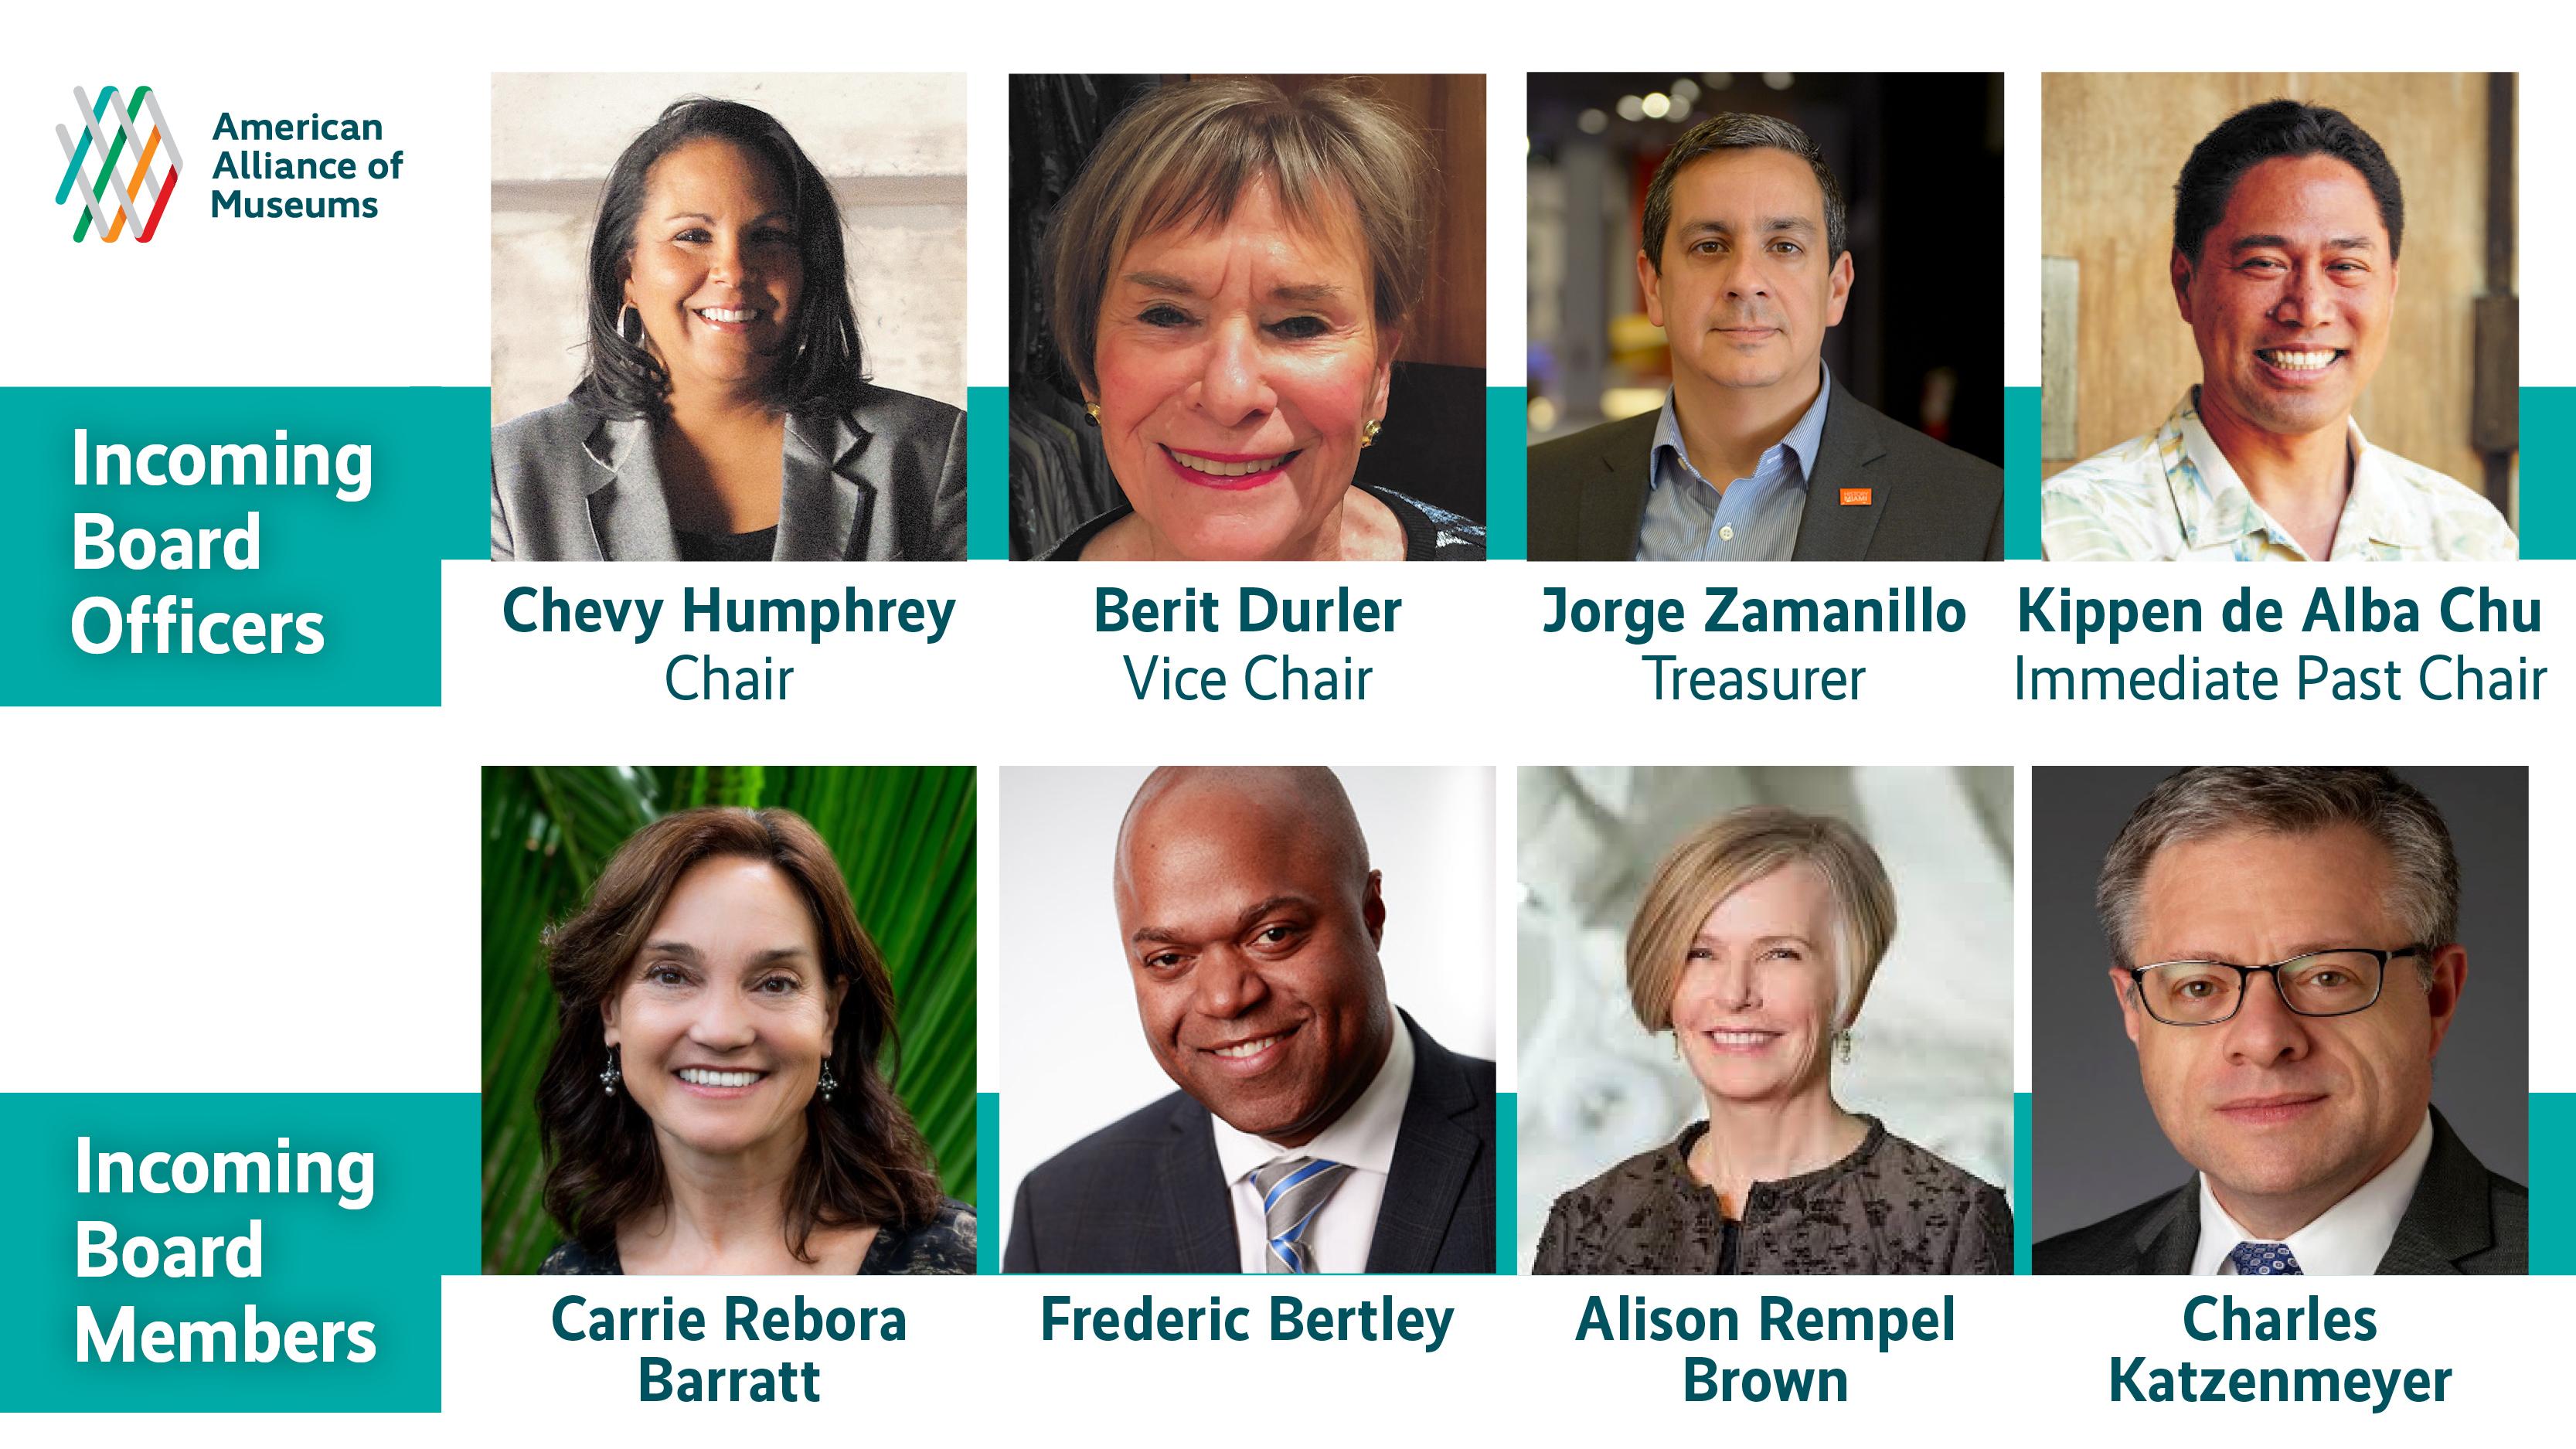 Thumbnail photos of eight board members